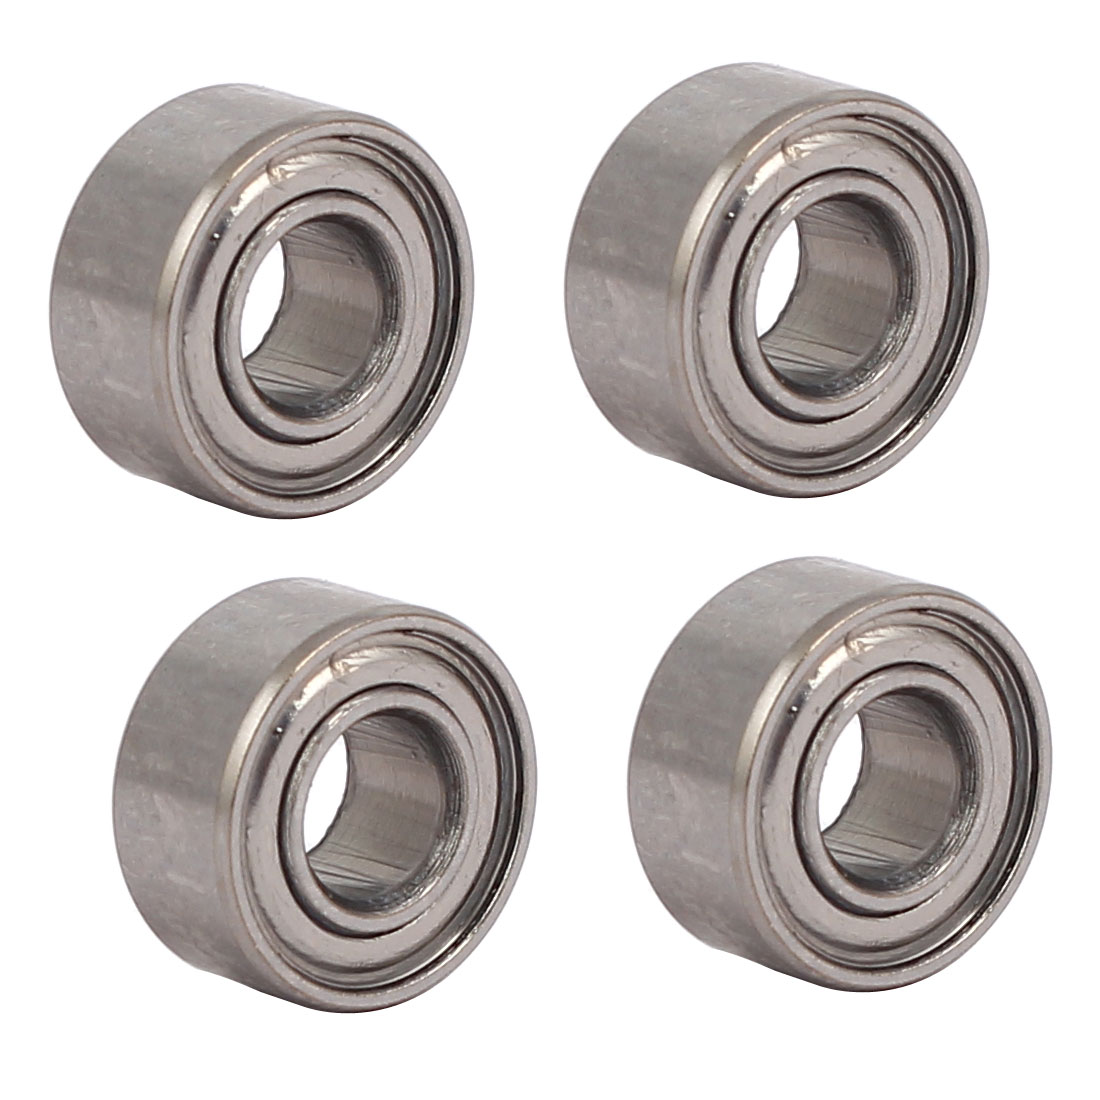 11mmx5mmx5mm 685 Stainless Steel Shielded Deep Groove Ball Bearing 4pcs